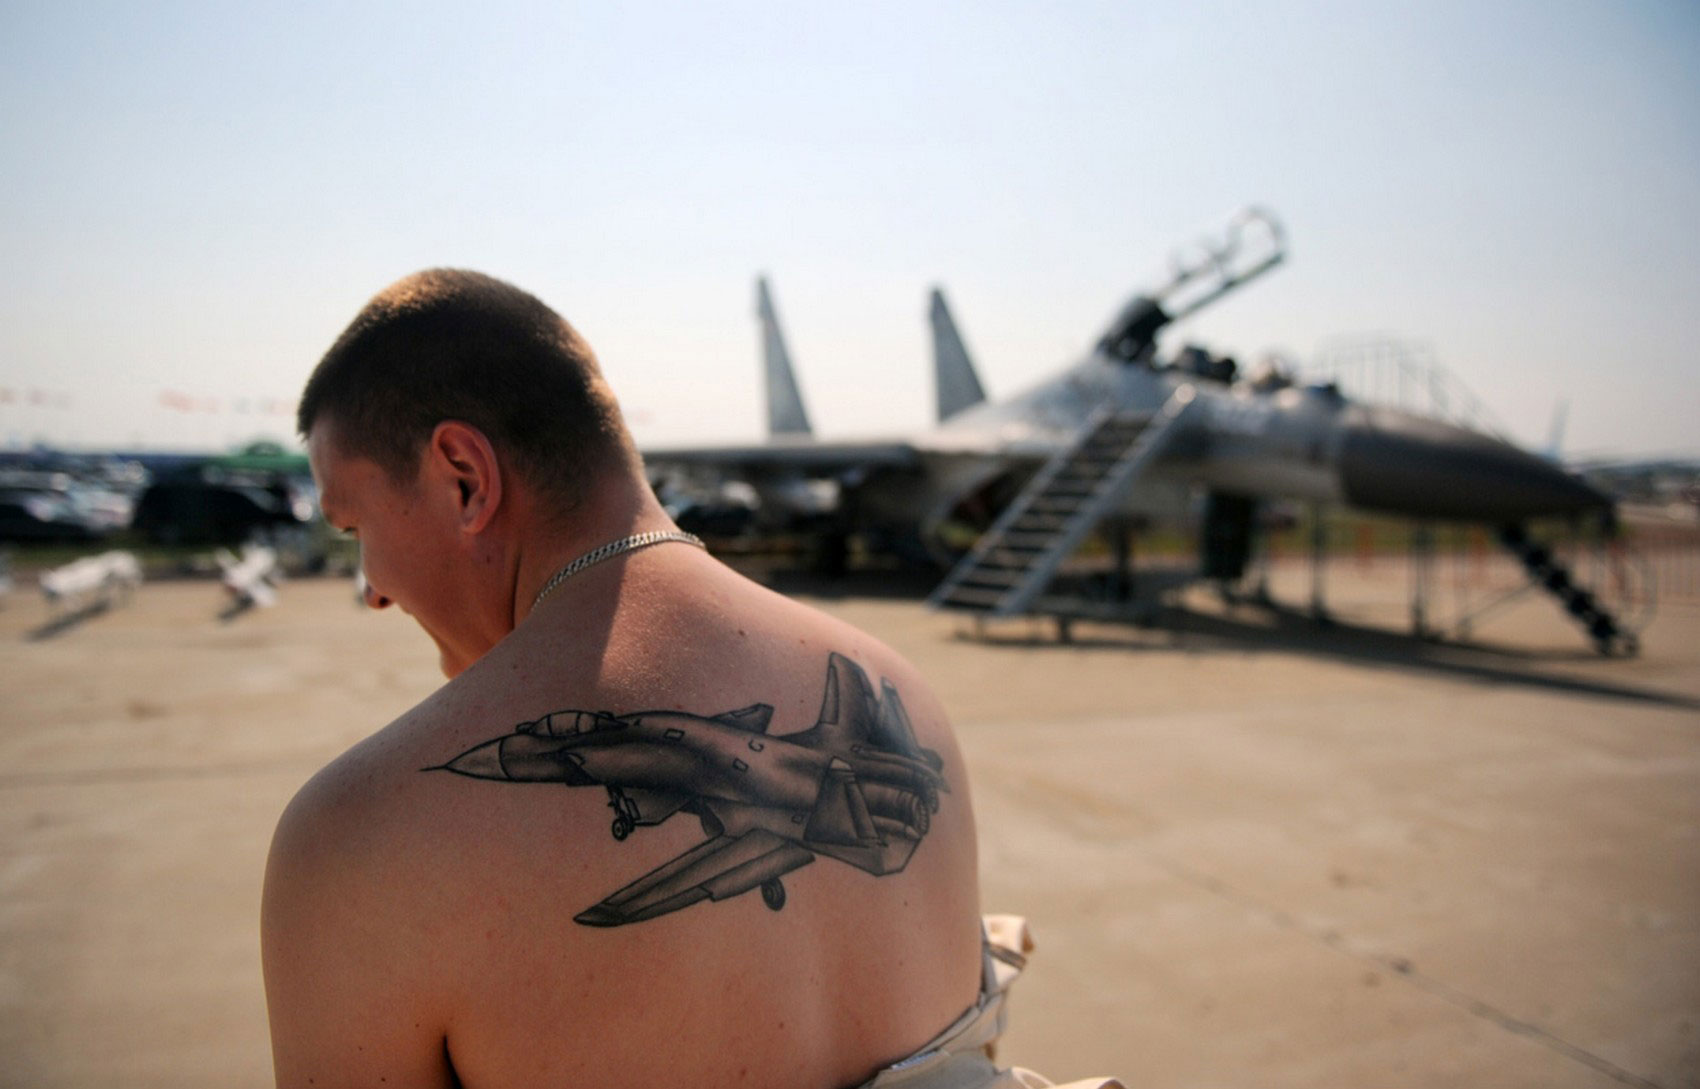 татуировка солдата, фото